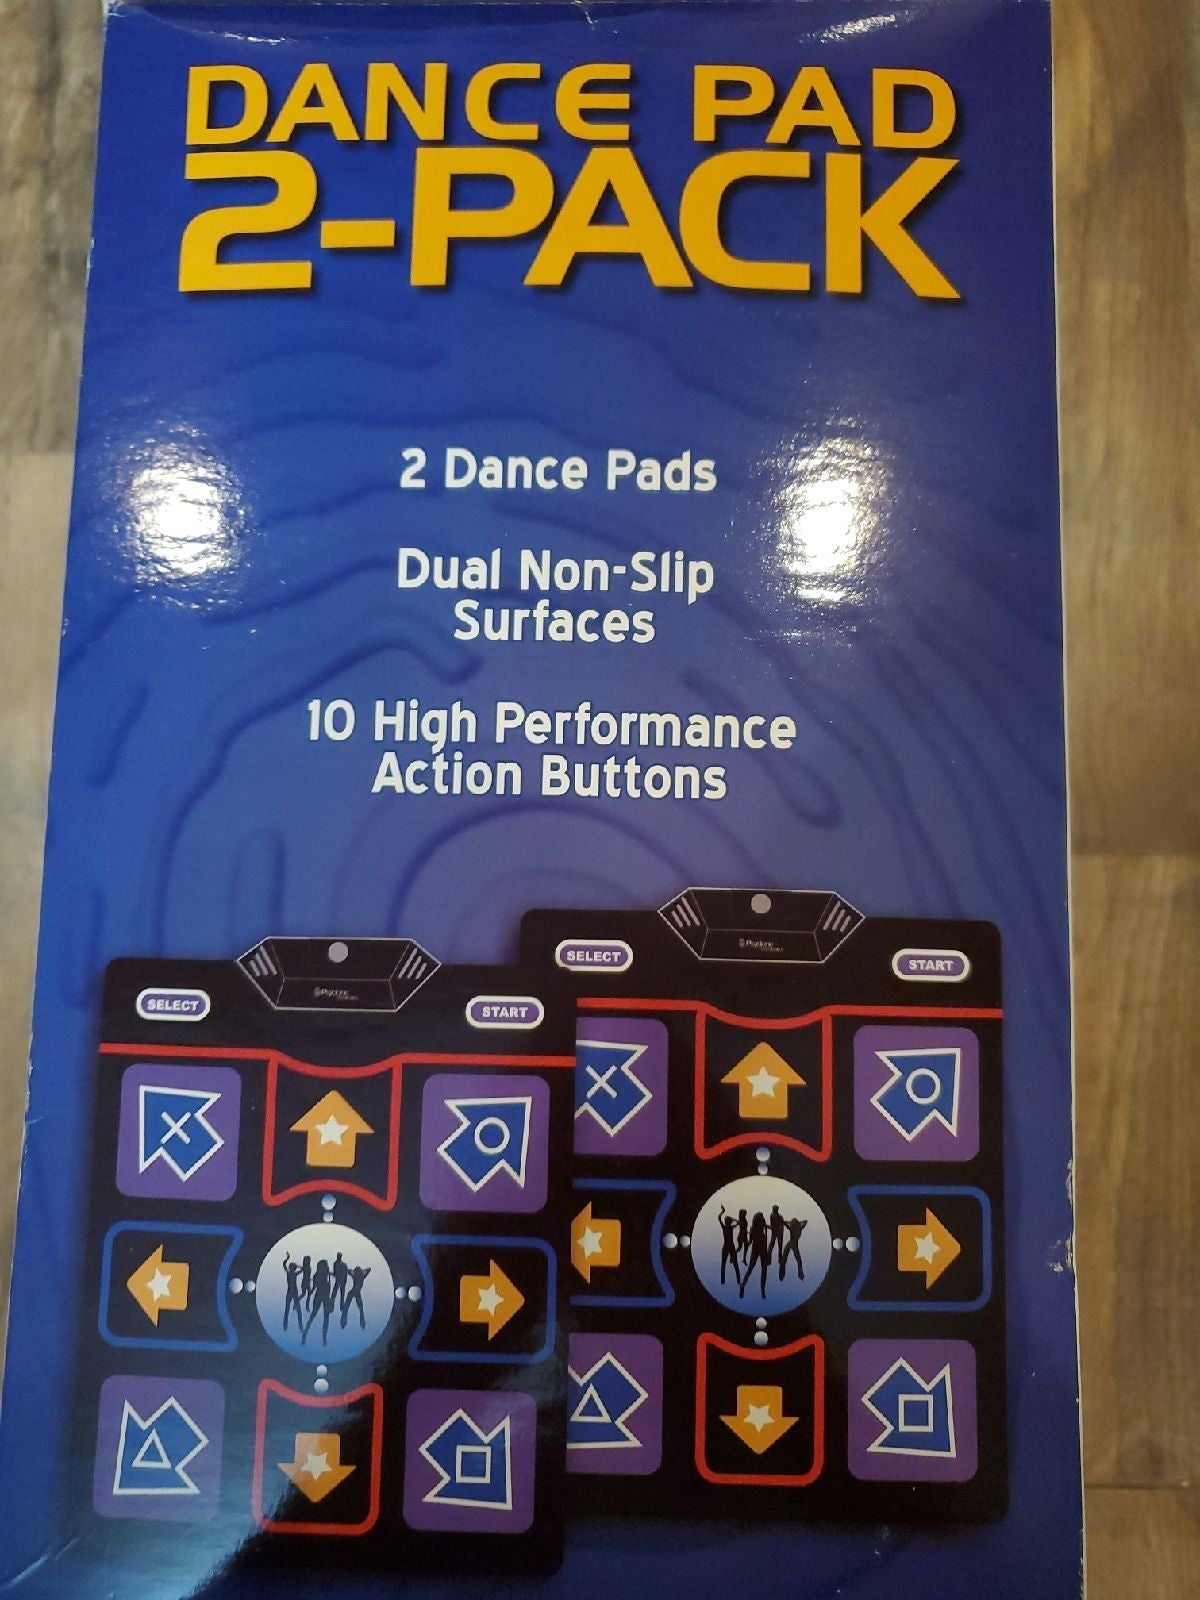 Dance pad 2 pack